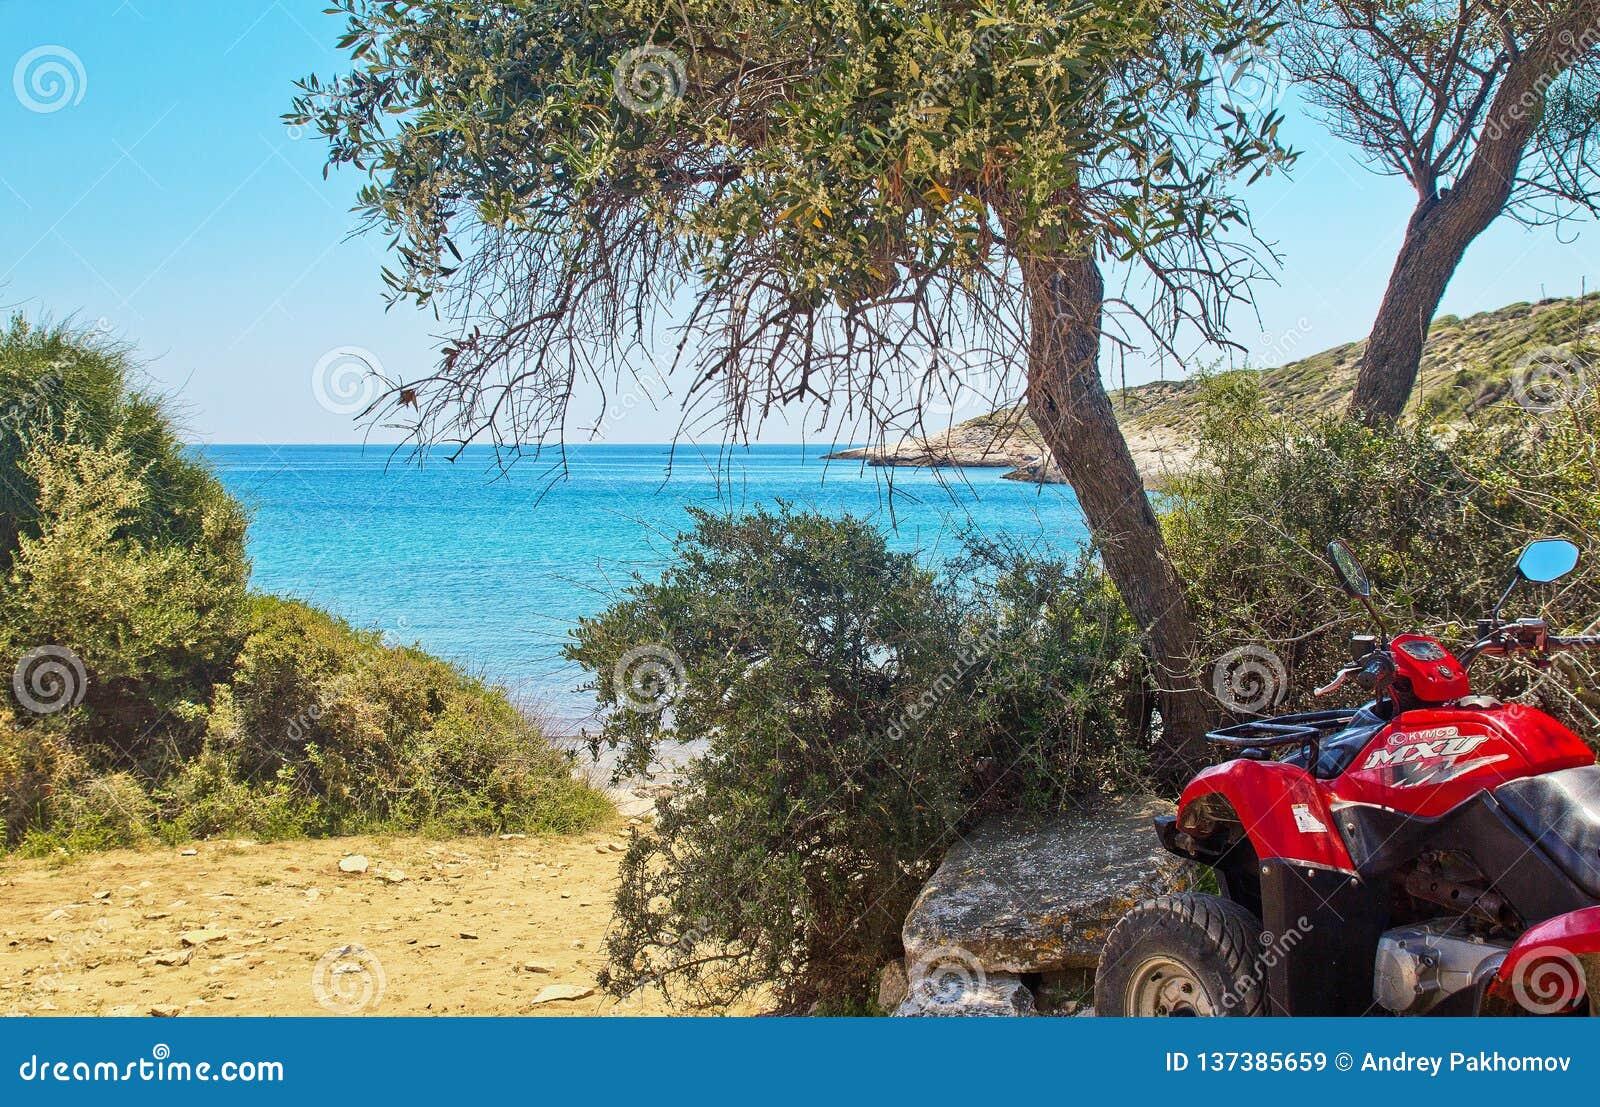 ATV parkuje na seashore na wyspie Thassos, Grecja widok piękna sceneria